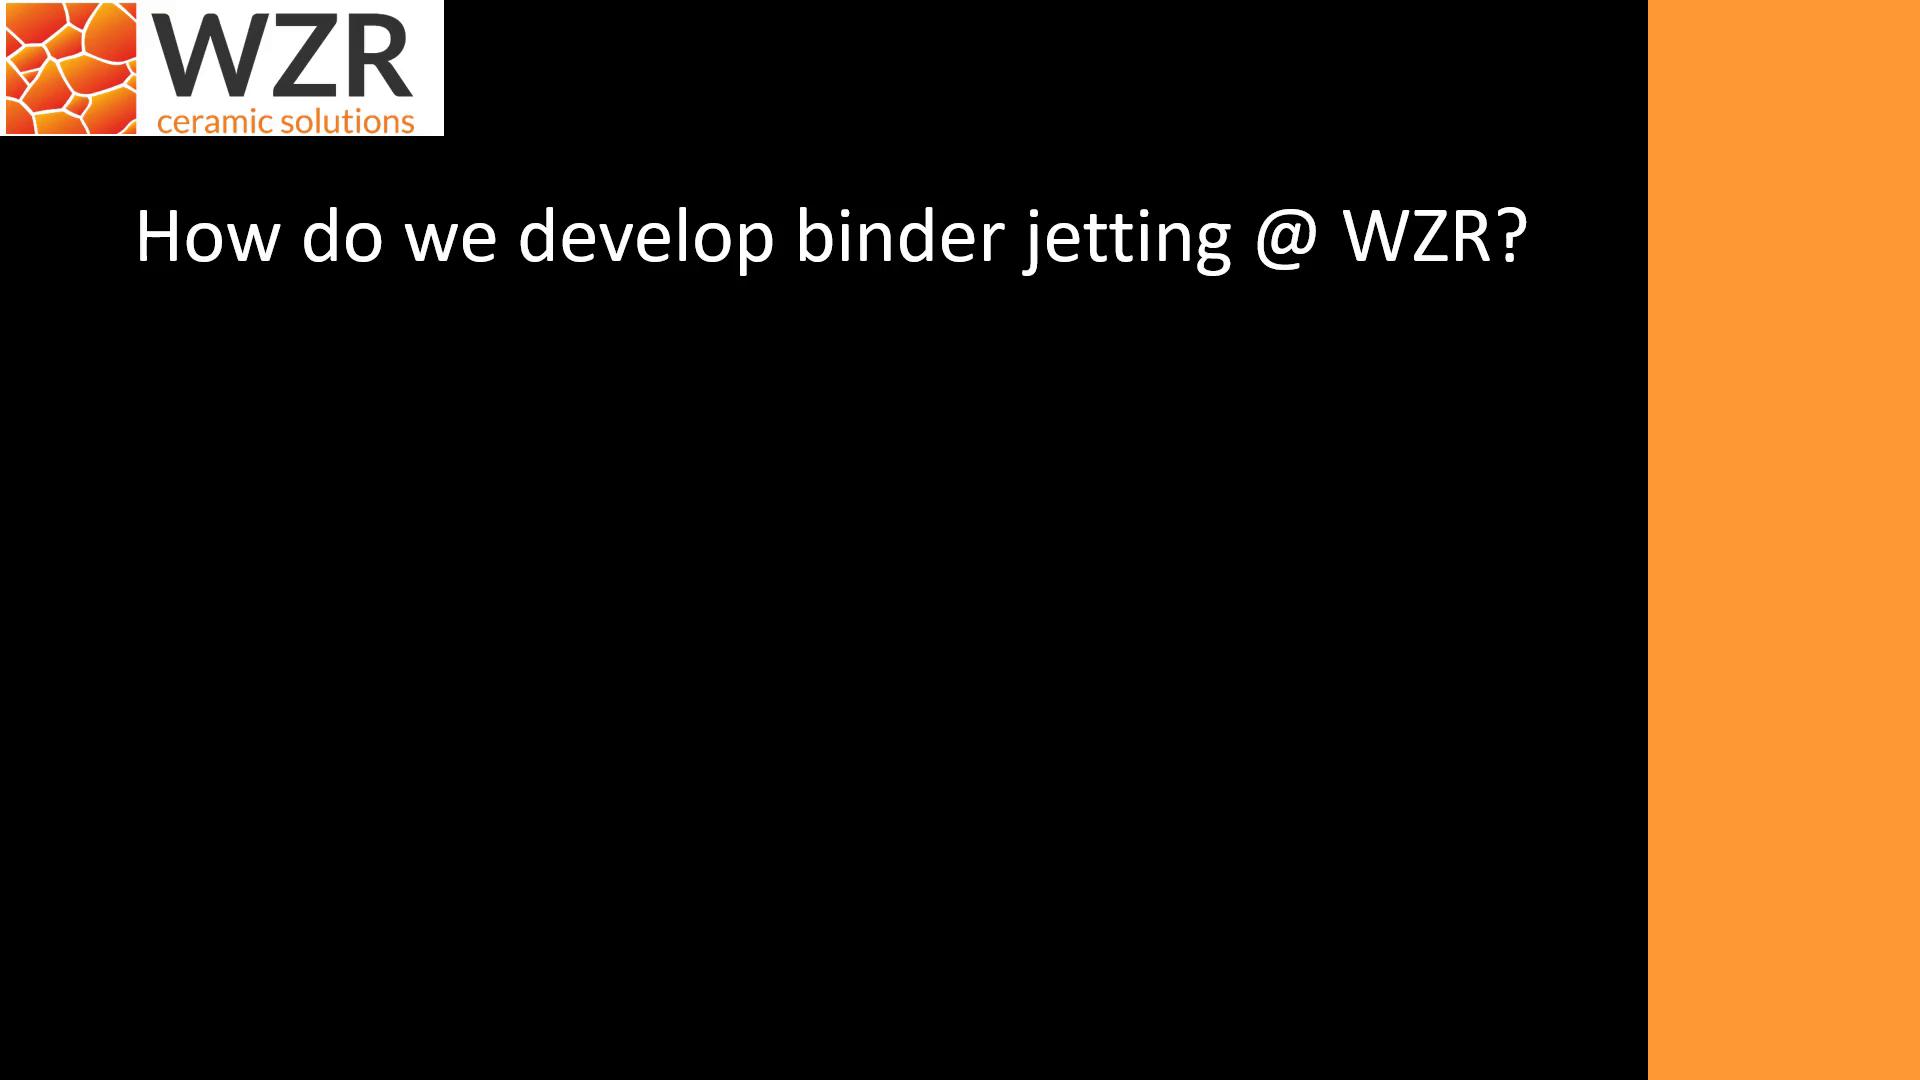 How do we develop binder jetting @ WZR?